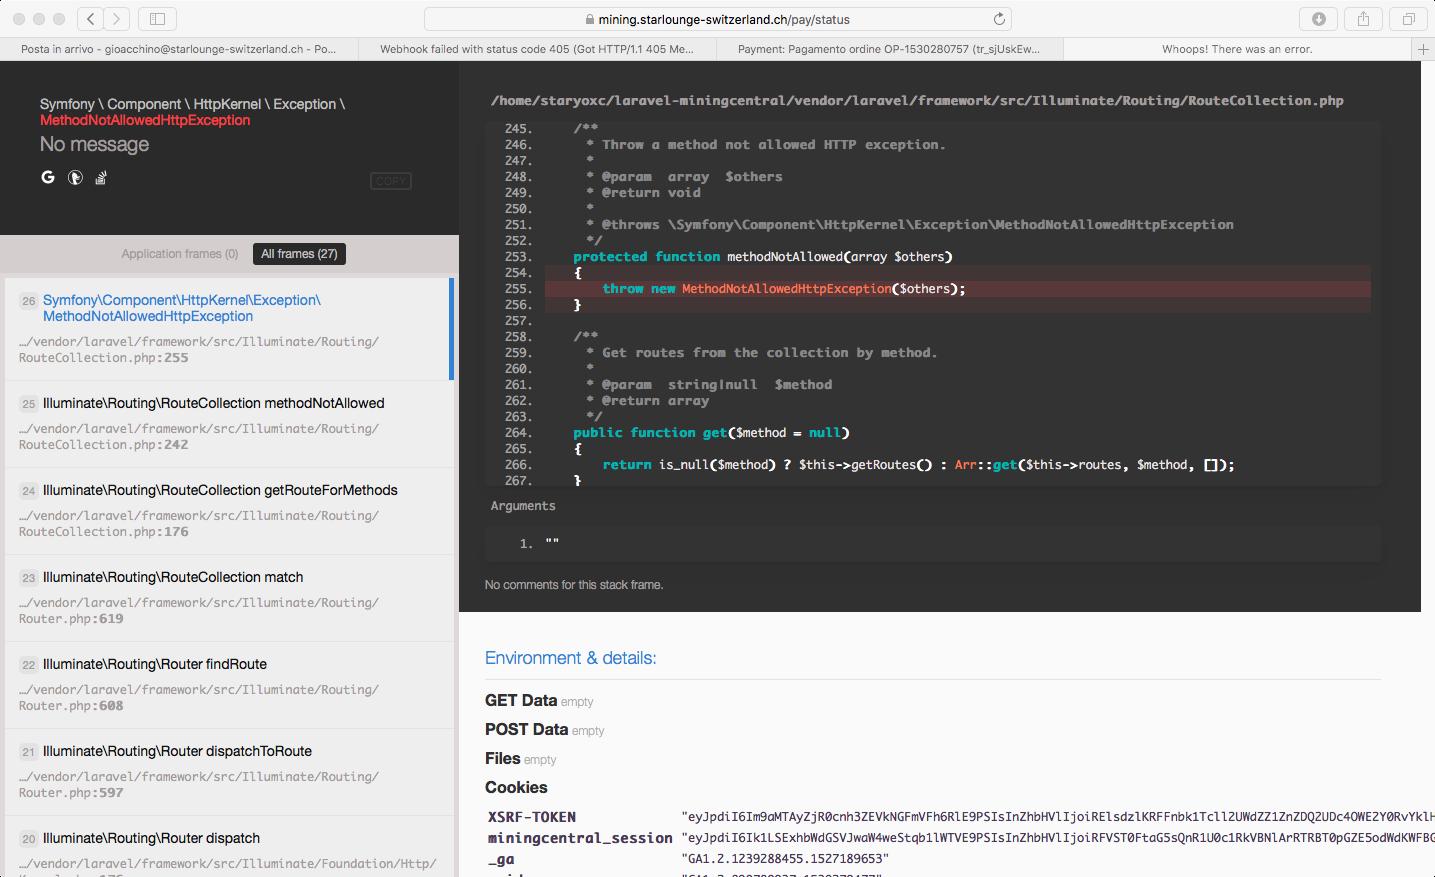 Webhook failed with status code 405 (Got HTTP/1 1 405 Method